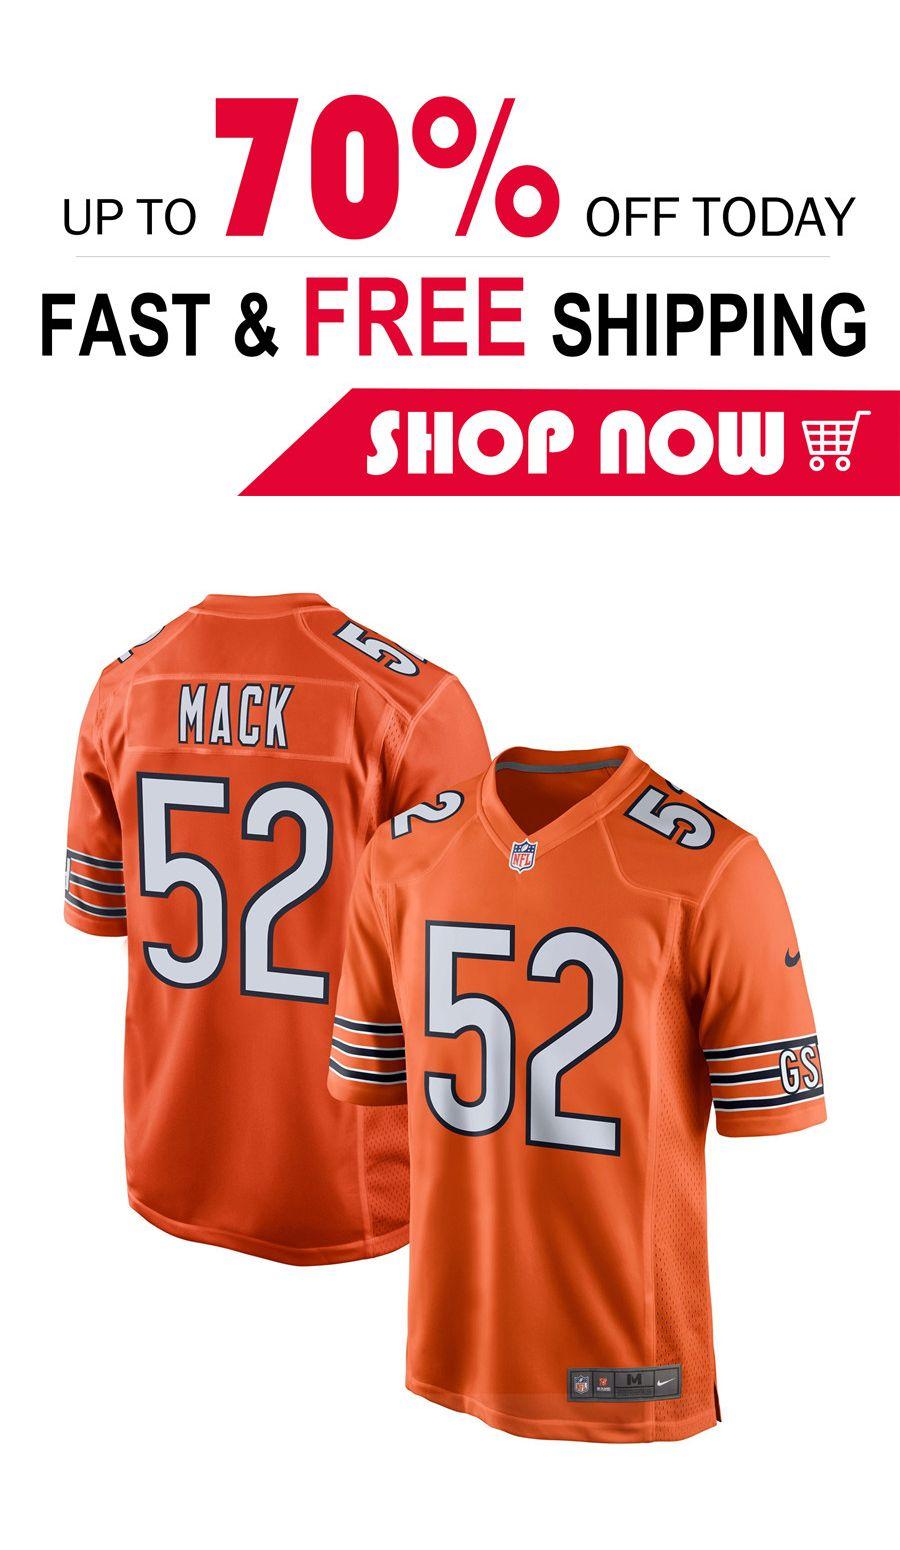 best website d81aa b2f59 Men s Chicago Bears Khalil Mack football Game jersey in 2019 ...